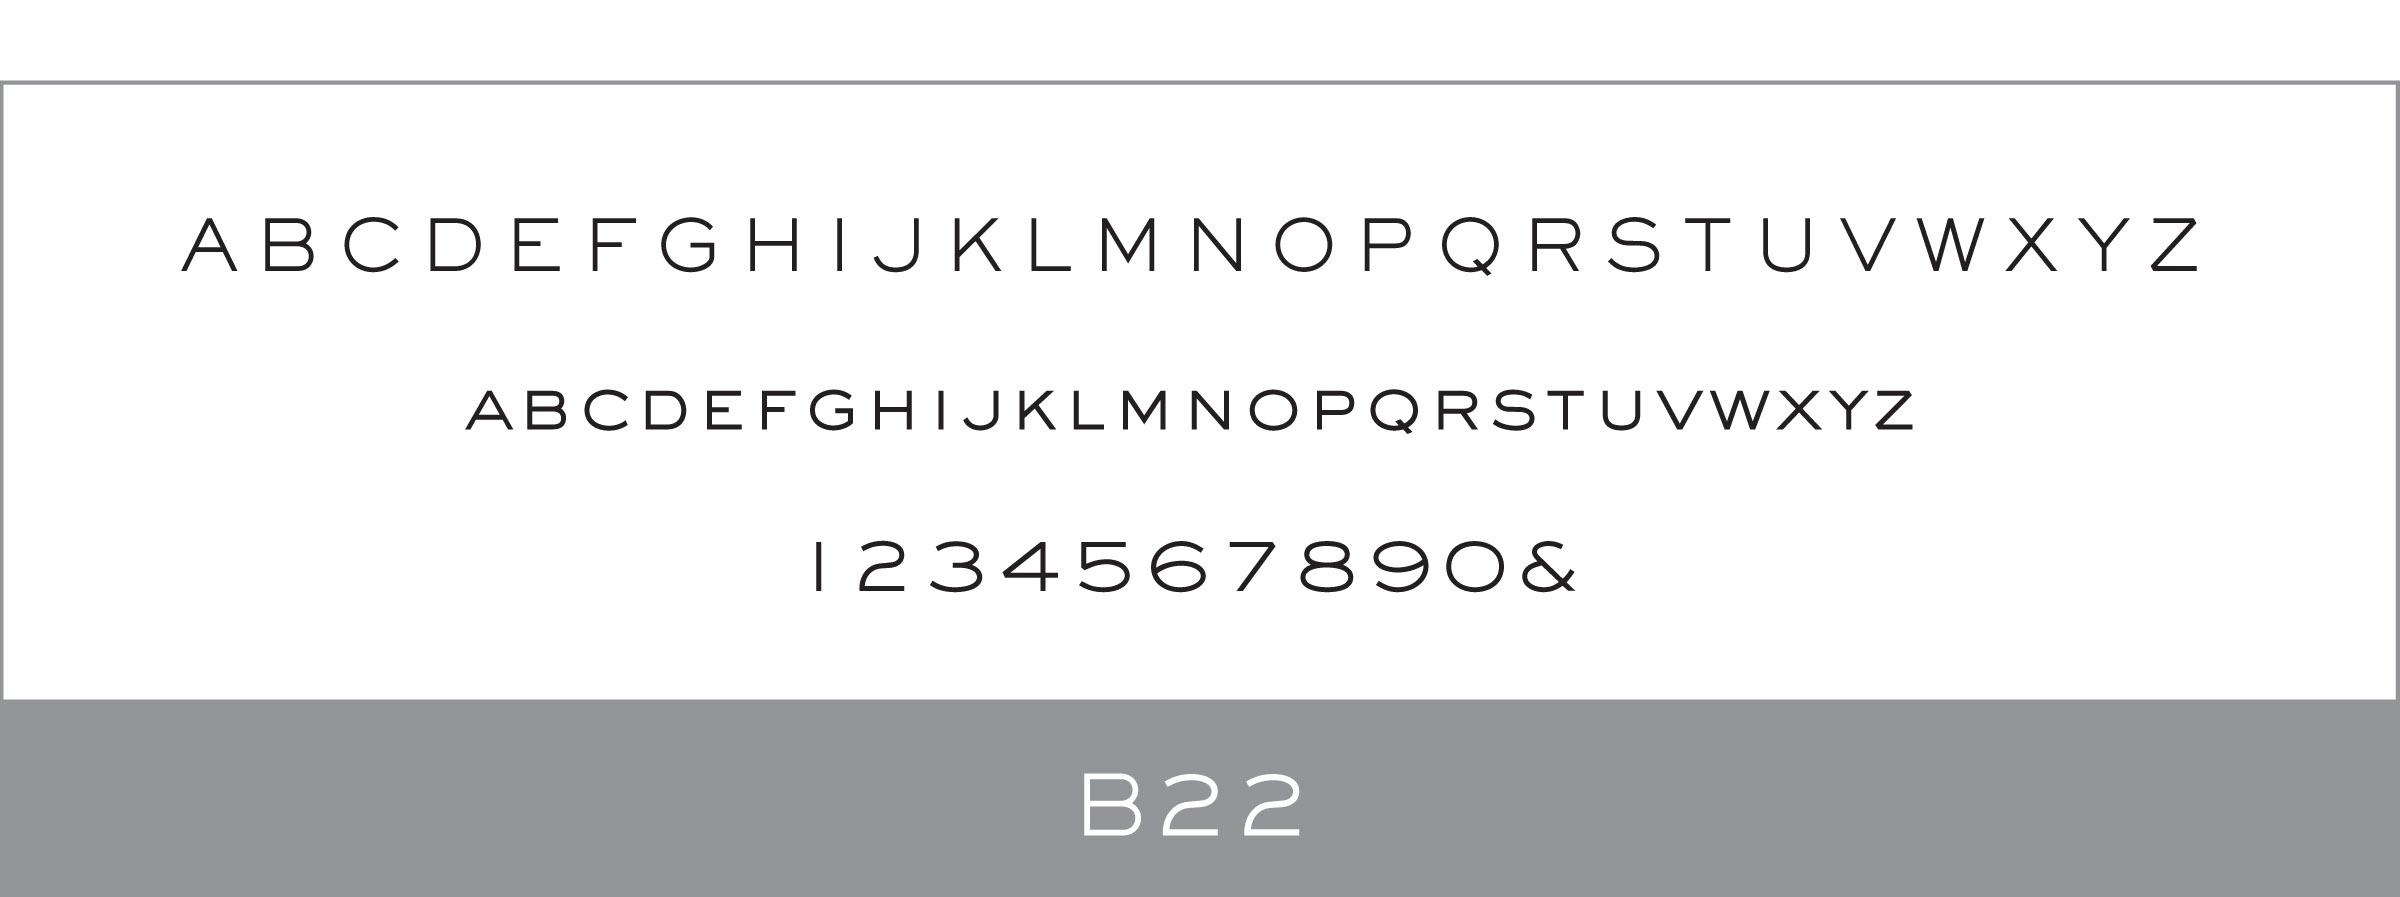 B22_Haute_Papier_Font.jpg